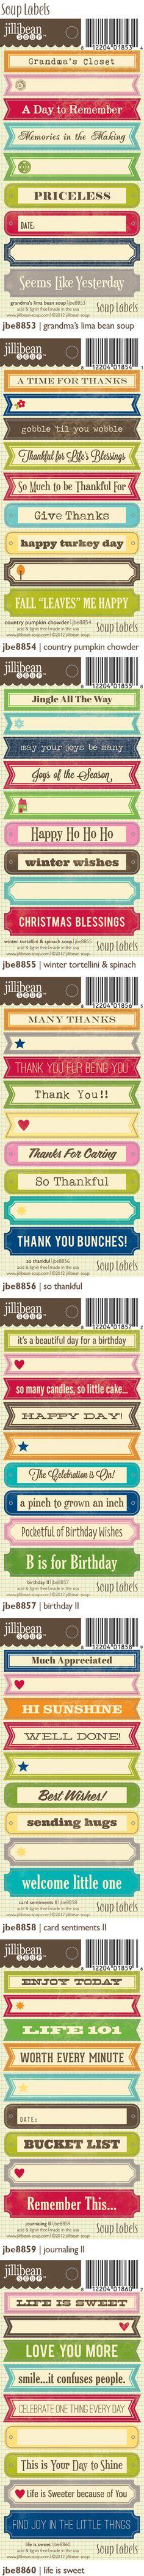 2012 Summer Soup Labels by Jillibean Soup (via the Jillibean Soup blog).